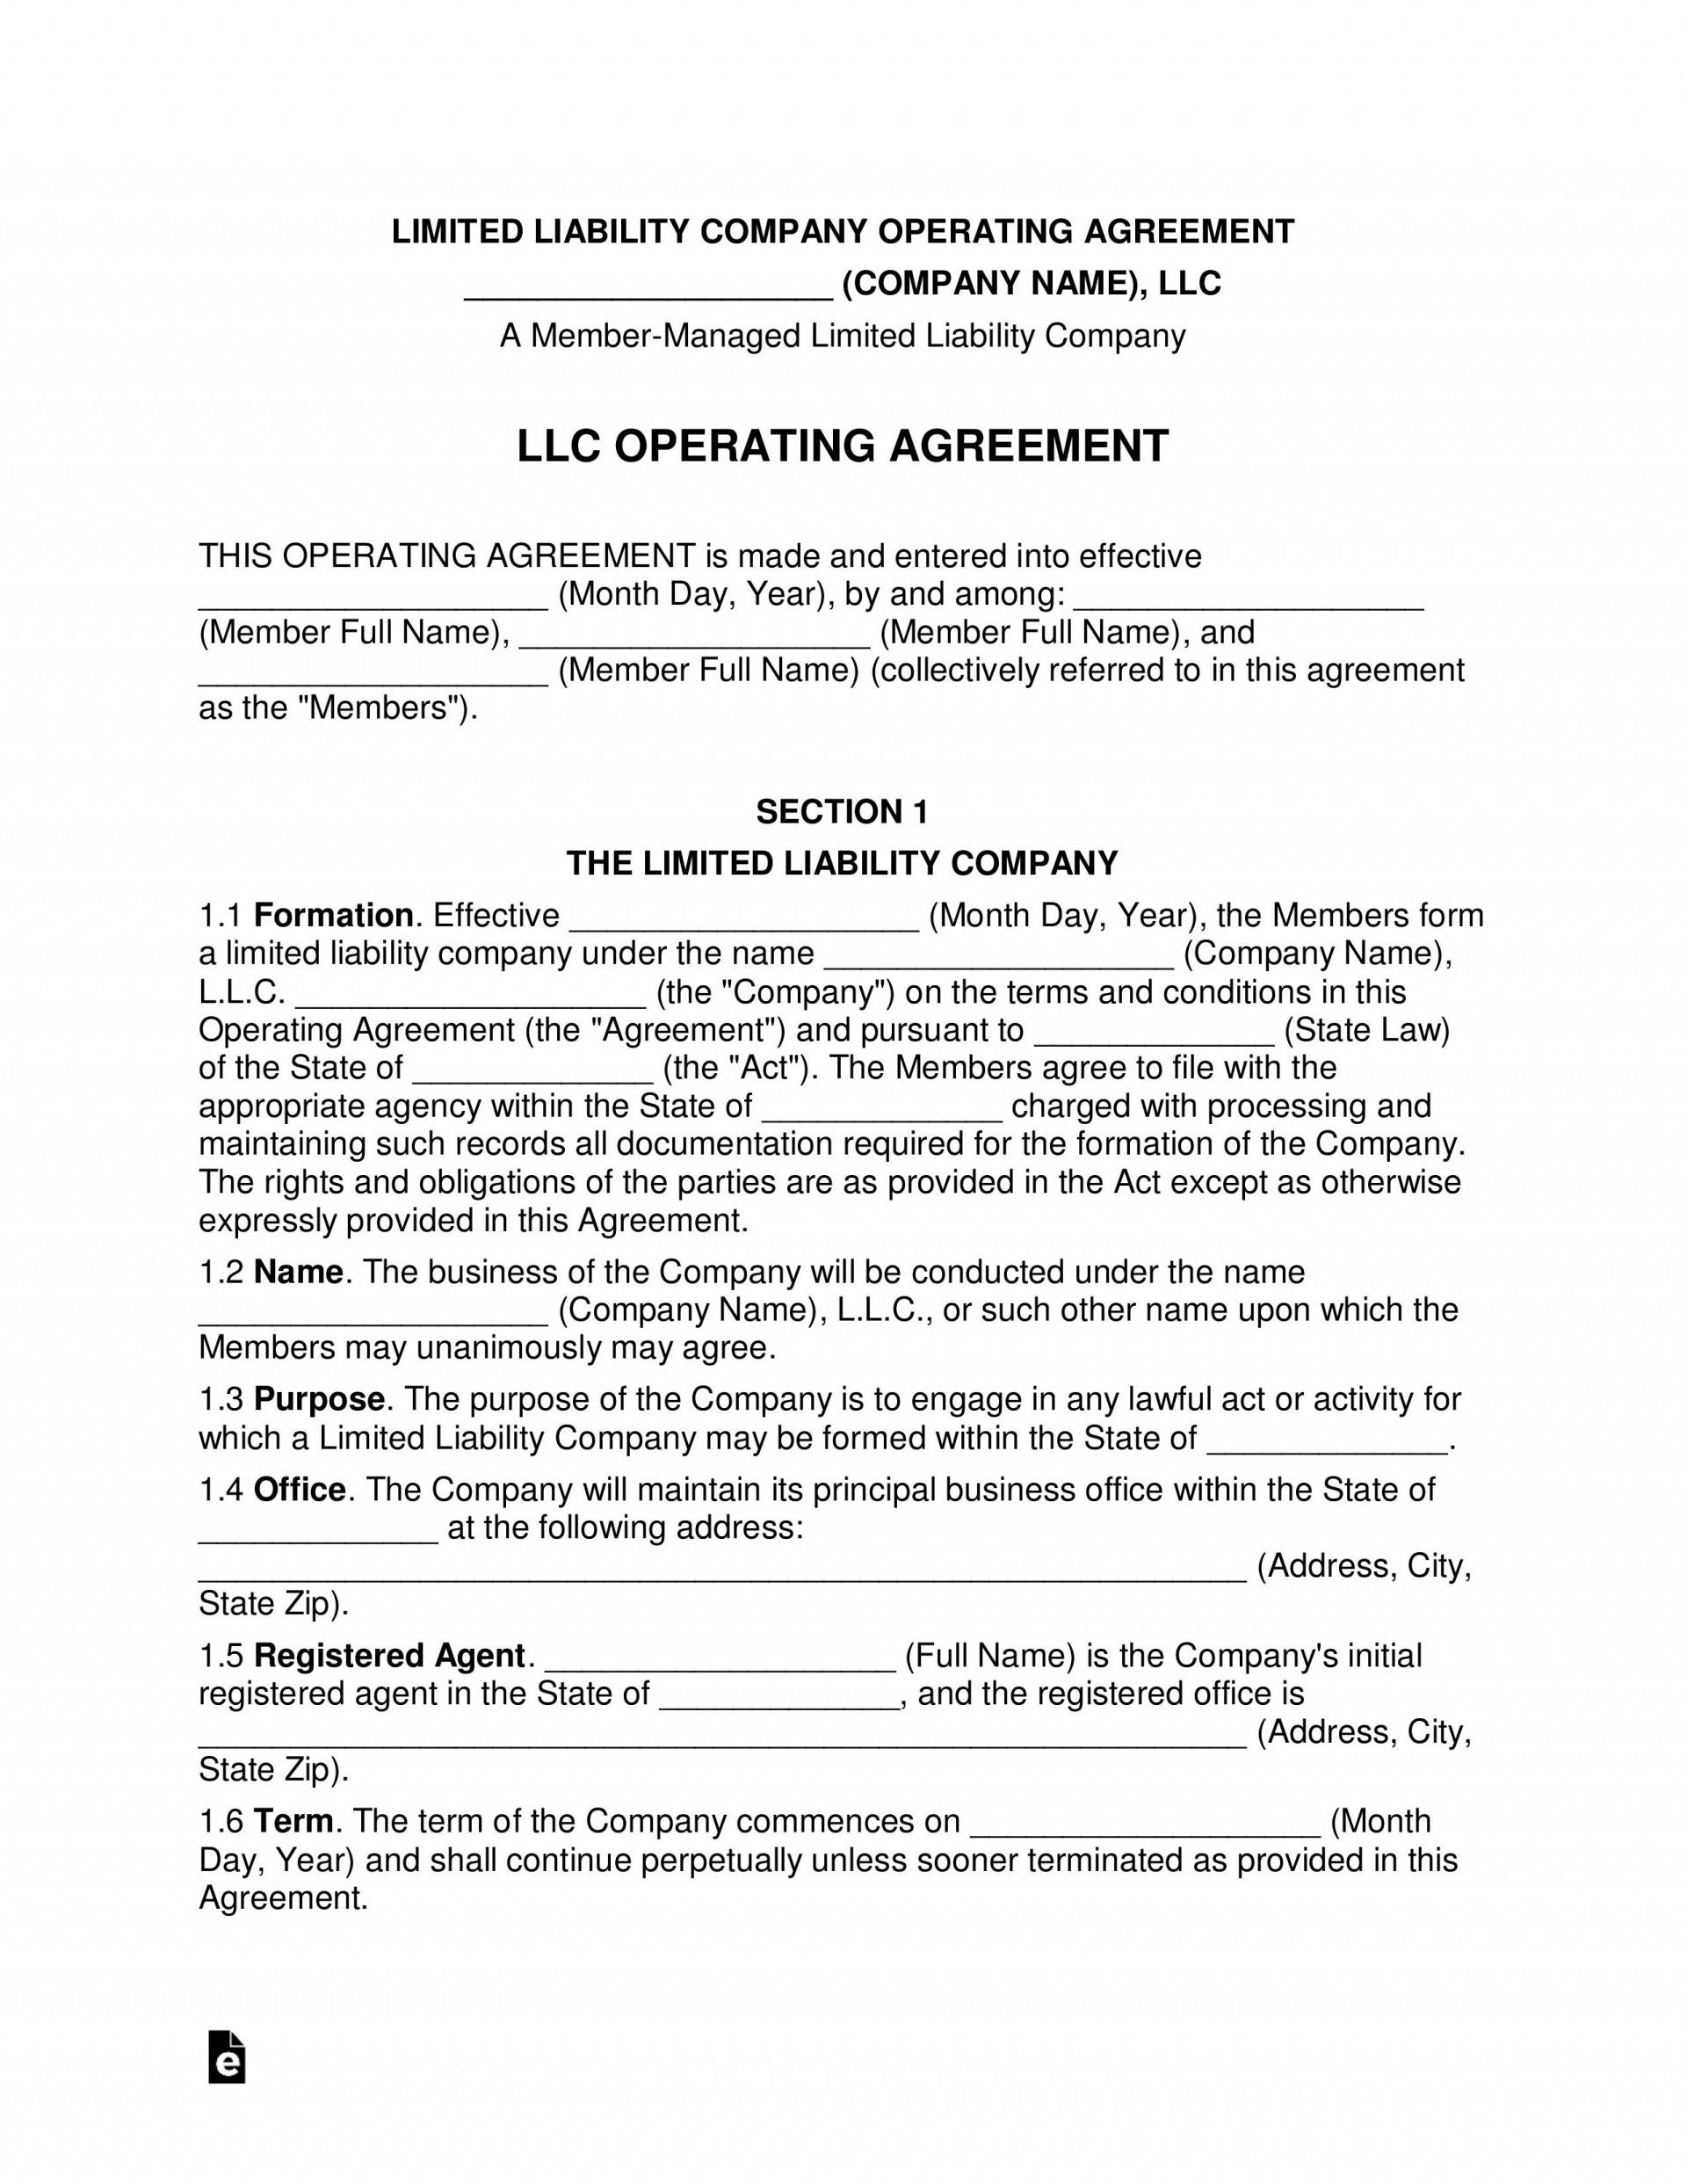 007 Rare Llc Operating Agreement Template Free Photo  Single Member Pdf Simple Download1920